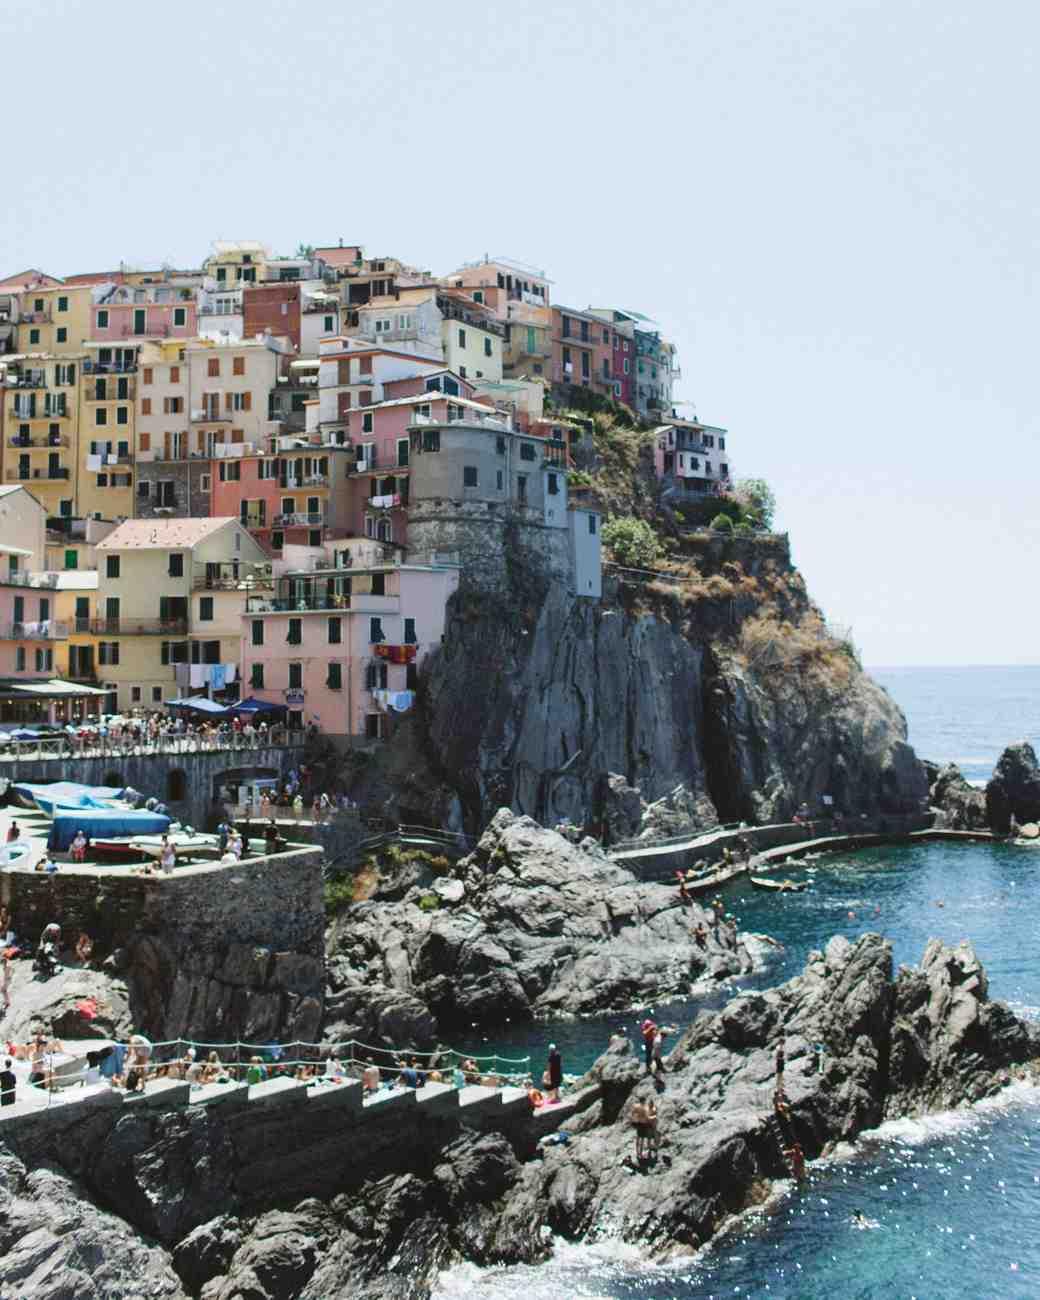 travel-honeymoon-diaries-houses-on-rocky-hill-italy-s112936.jpg